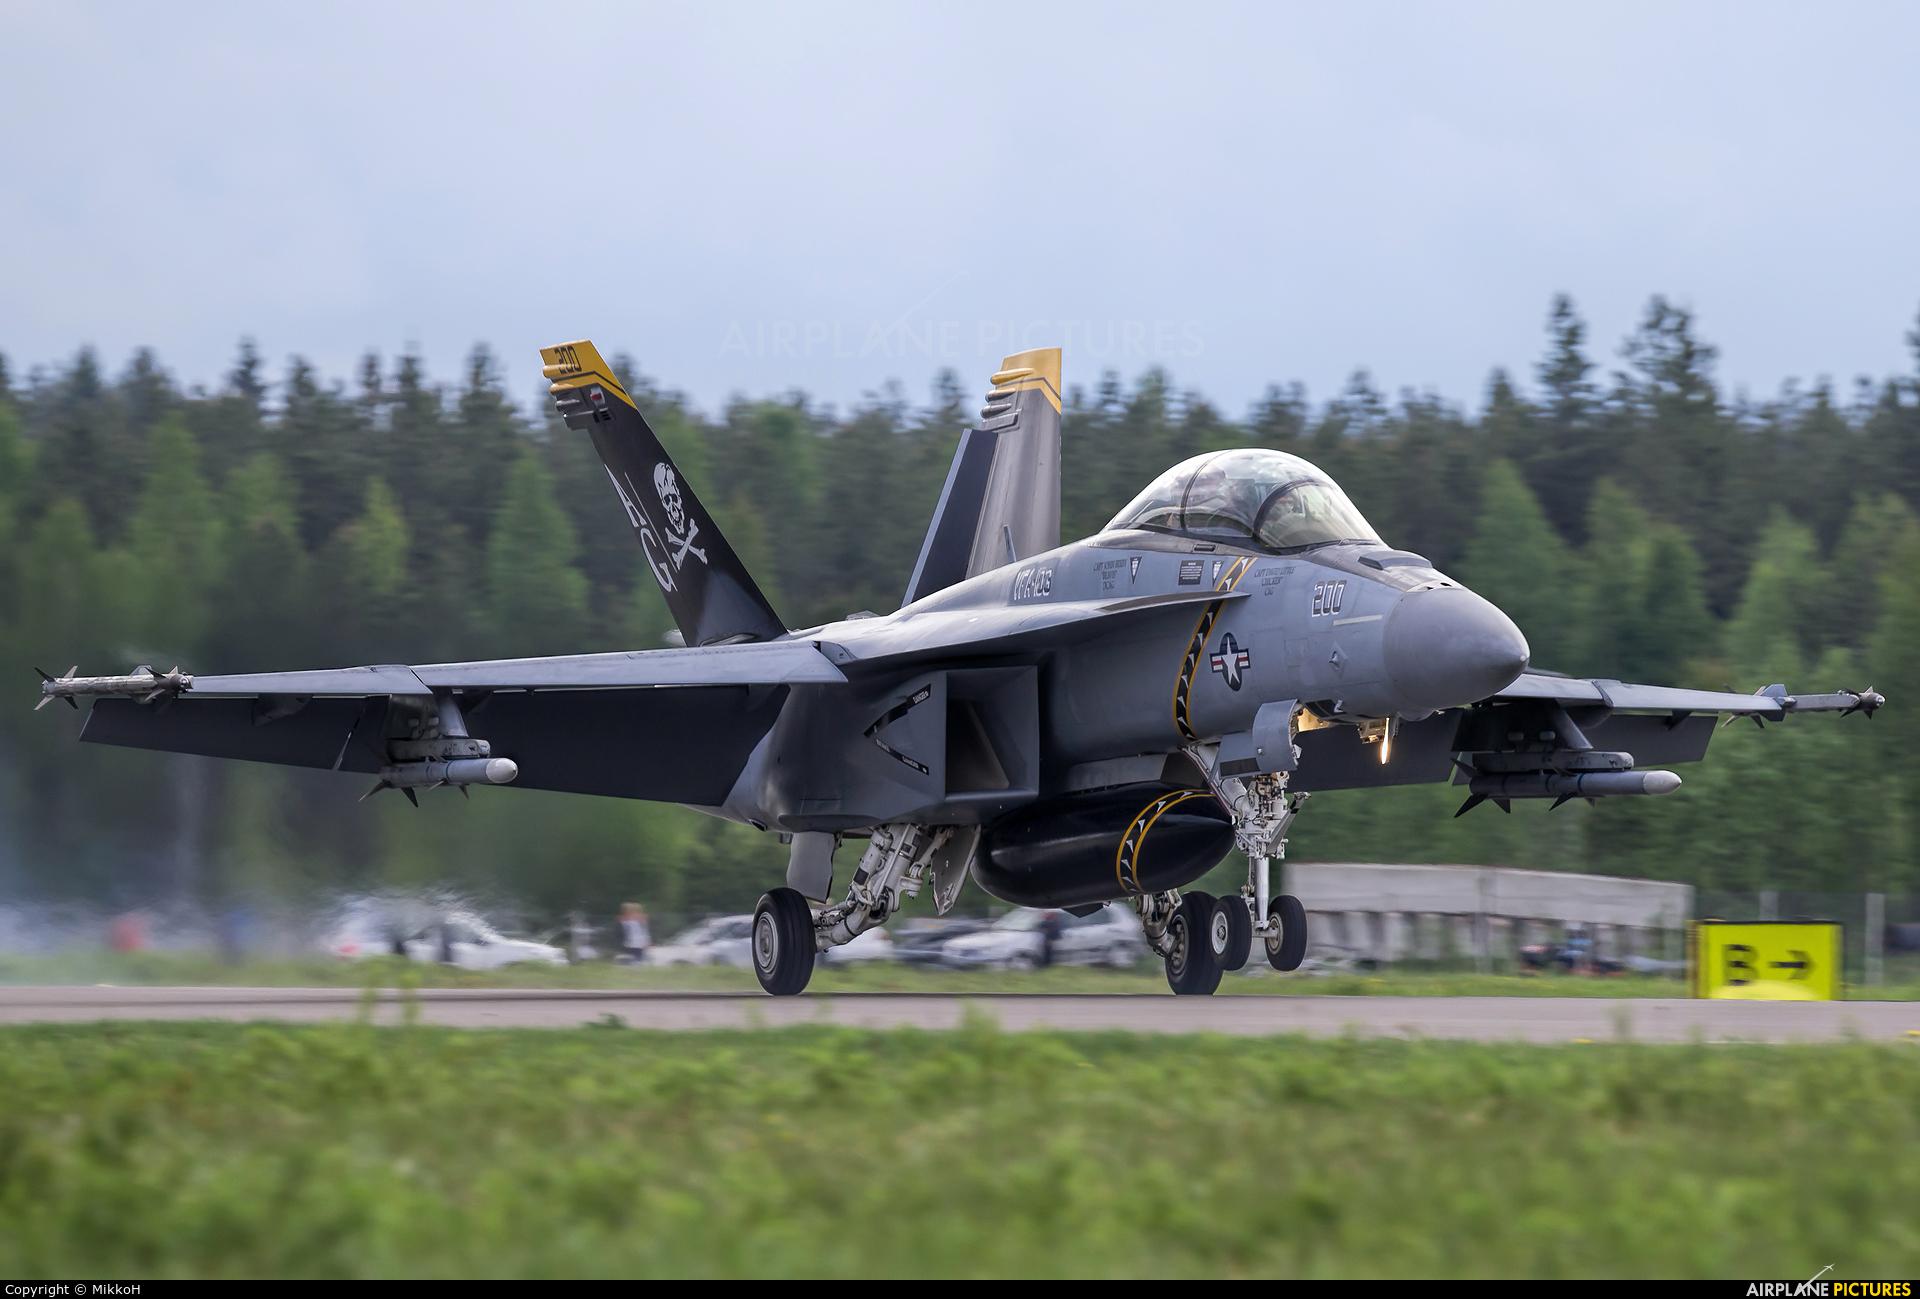 USA - Navy 168493 aircraft at Seinäjoki Airport